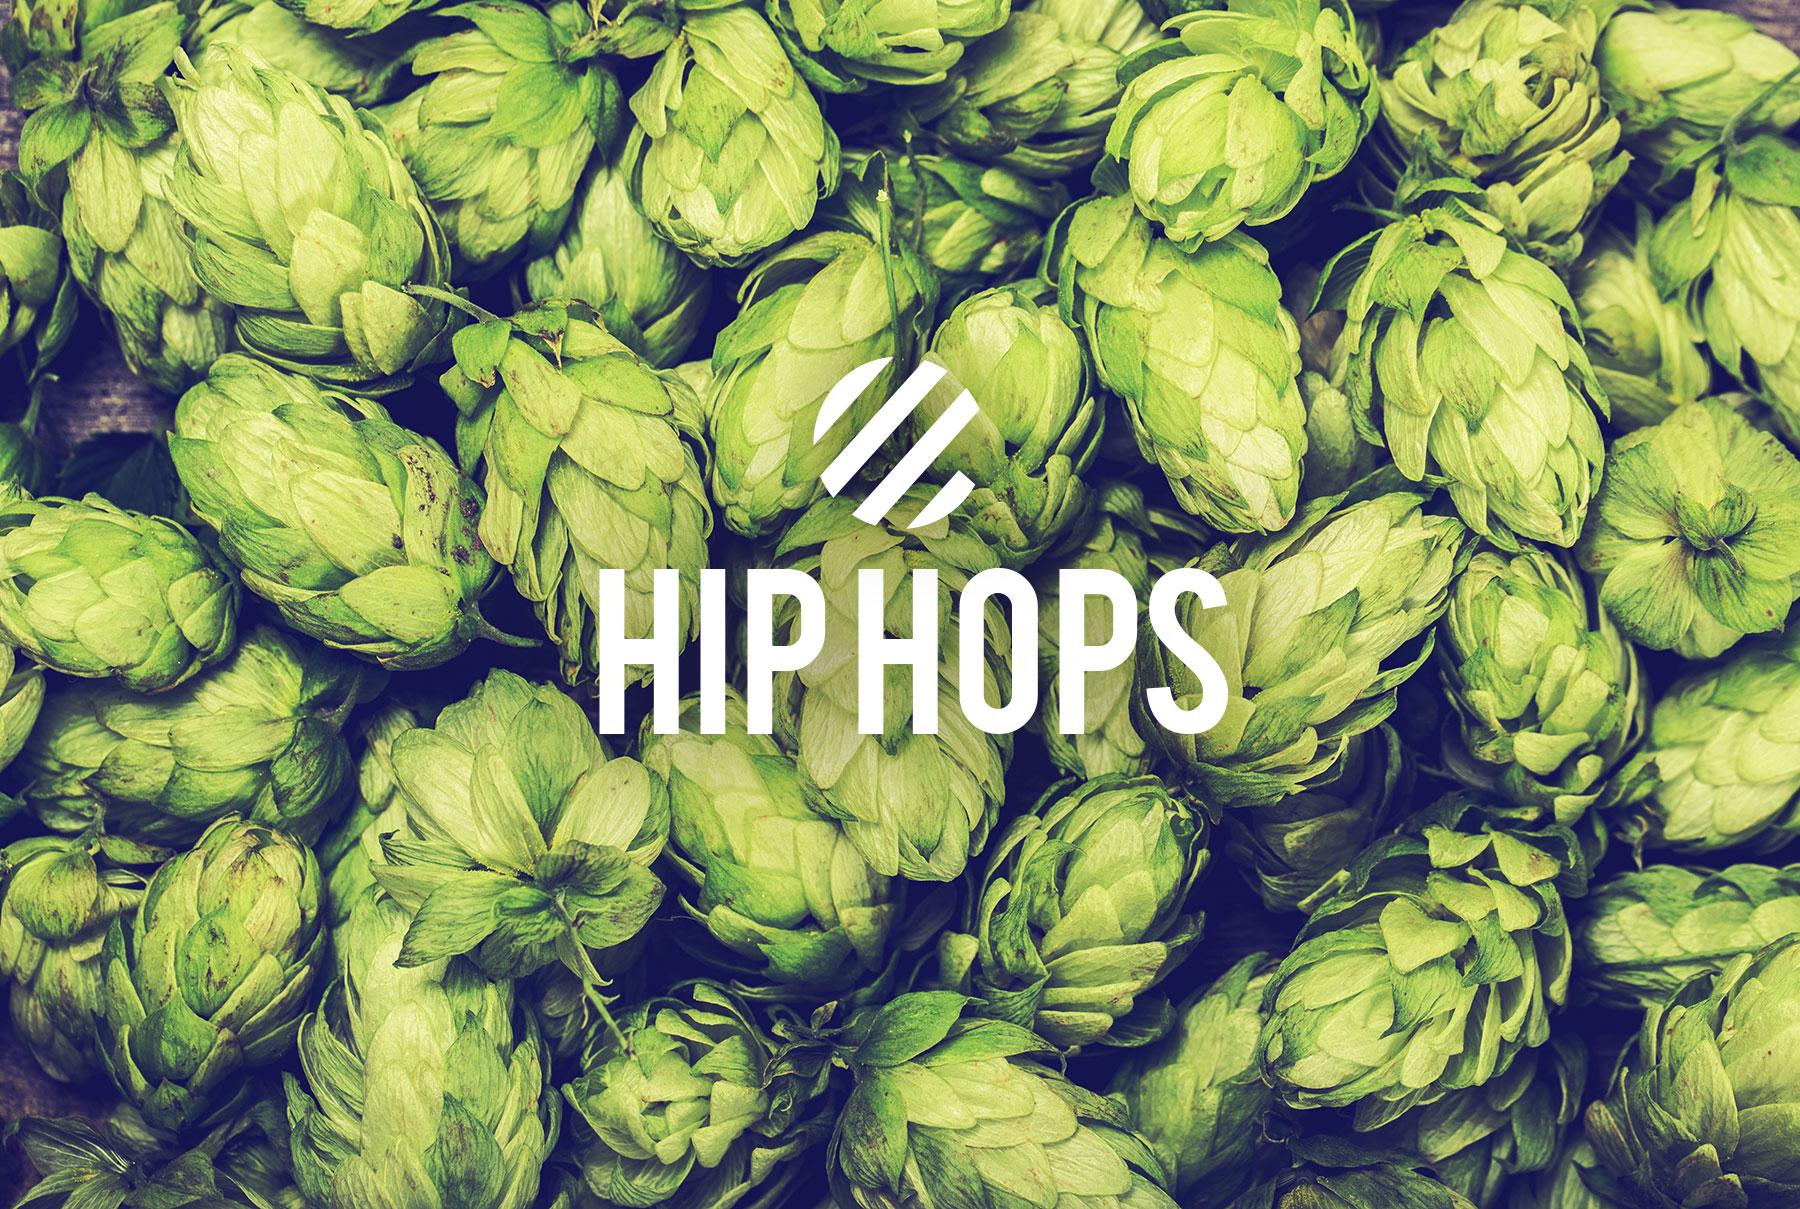 Hip Hops Beer Branding - Hip Hops